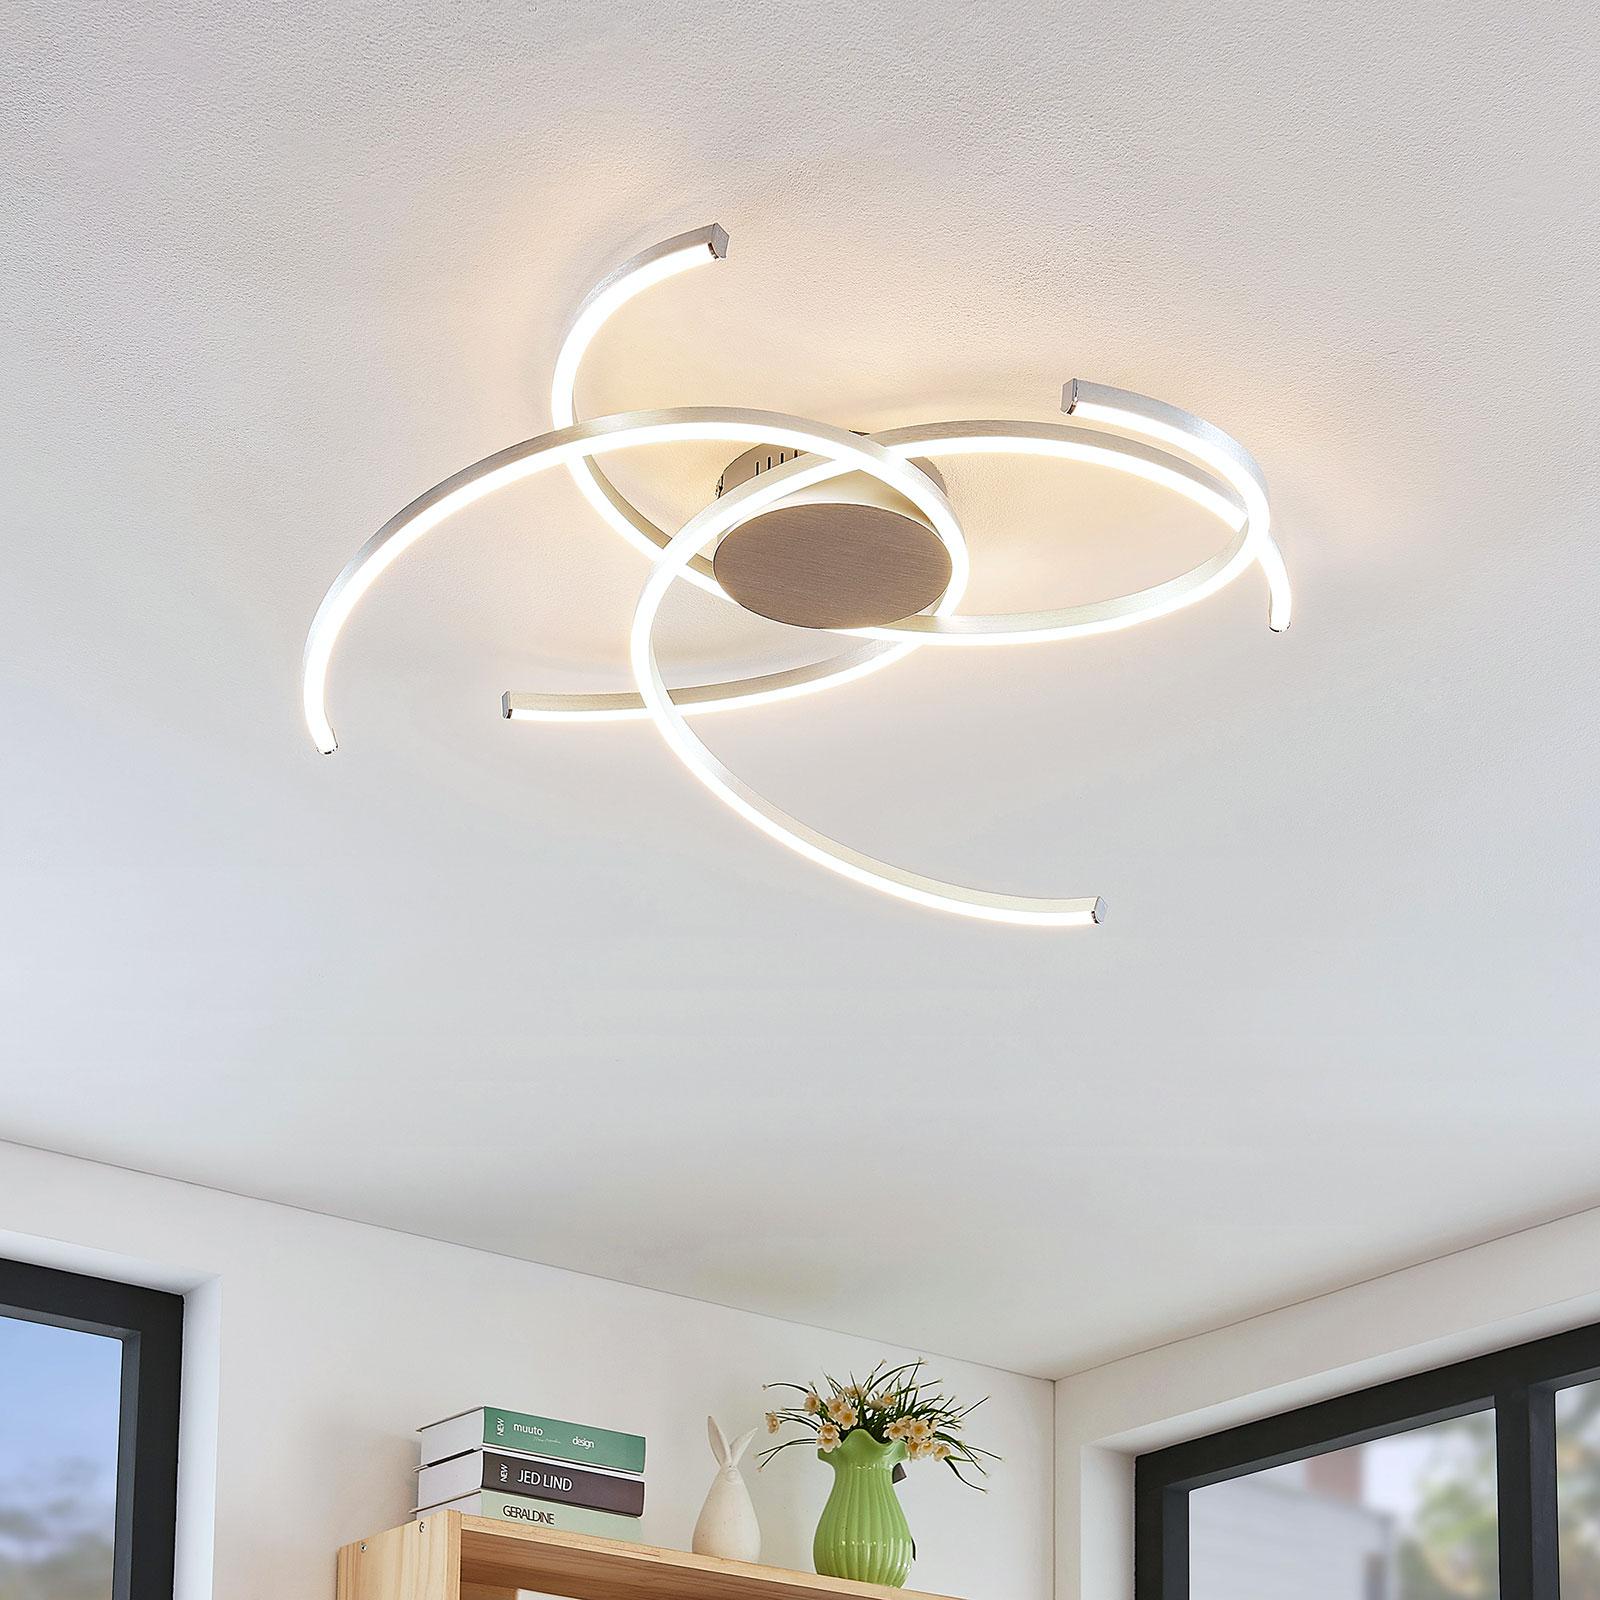 Acquista Lindby Katris plafoniera LED, 73 cm, alluminio